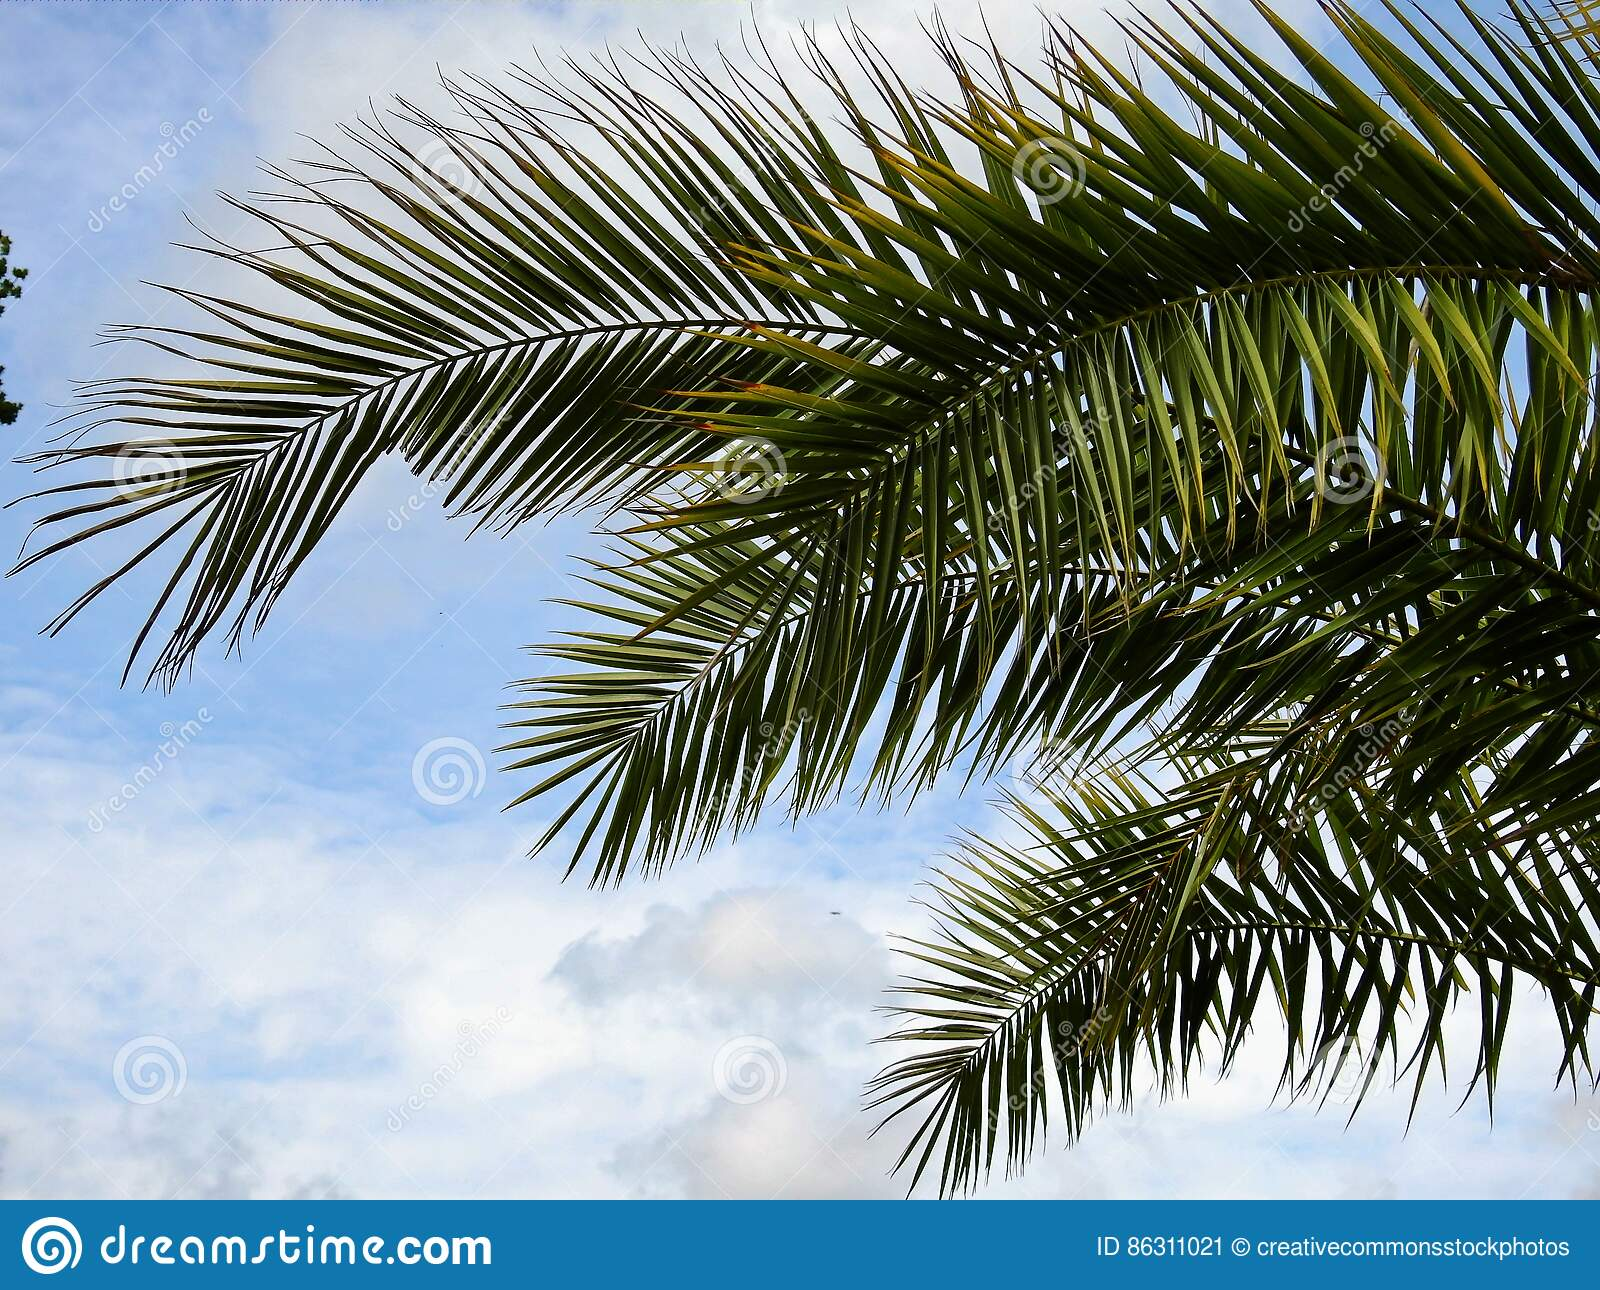 Free Public Domain CC0 Image  Green Palm Tree Under Blue Cloudy Sky ... 88bde4dec4e